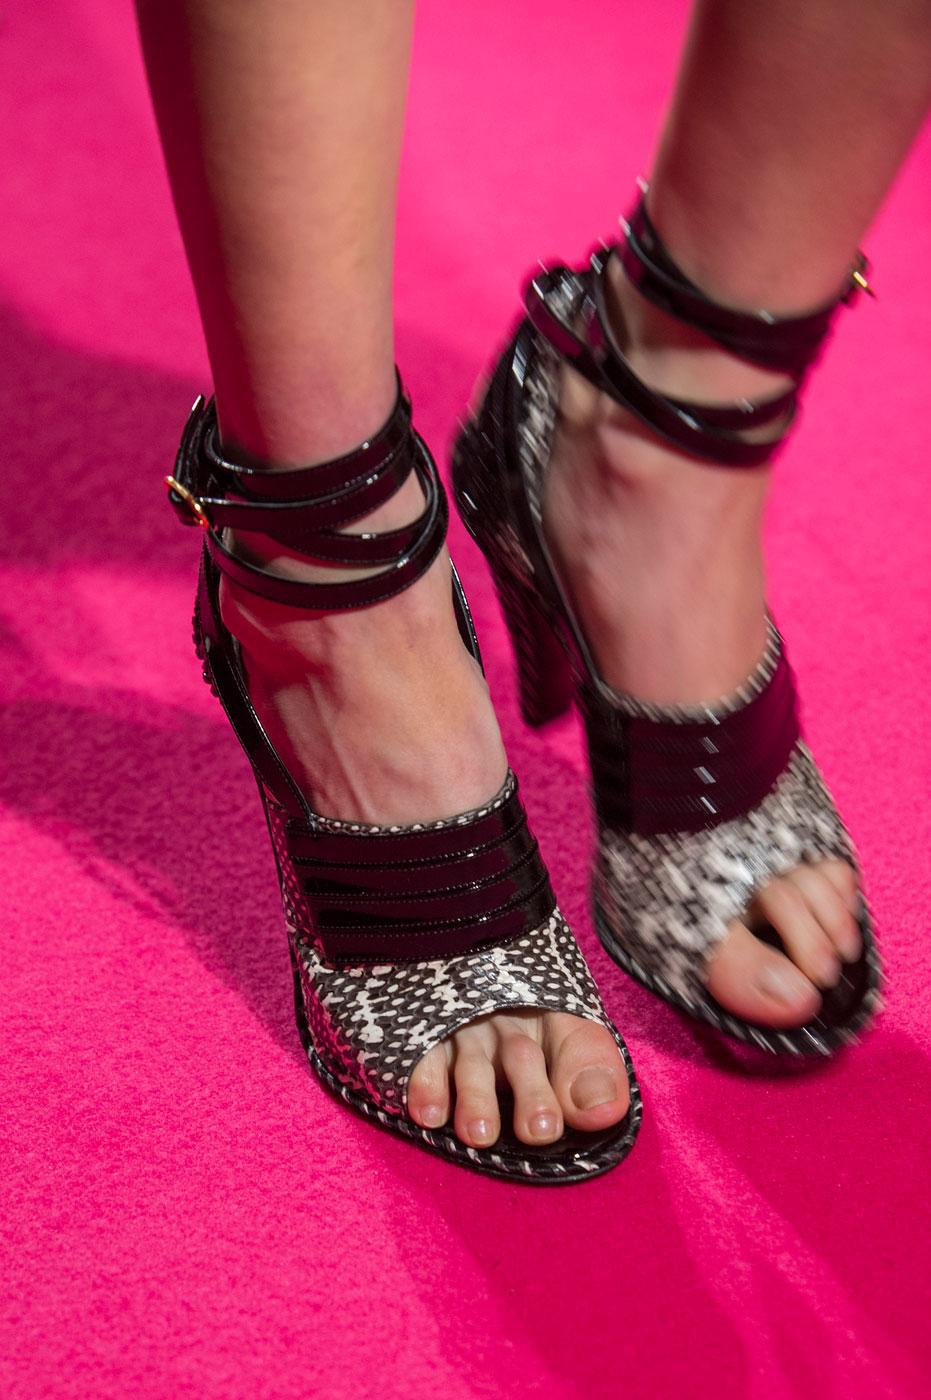 Schiaparelli-fashion-runway-show-close-ups-haute-couture-paris-spring-summer-2015-the-impression-61